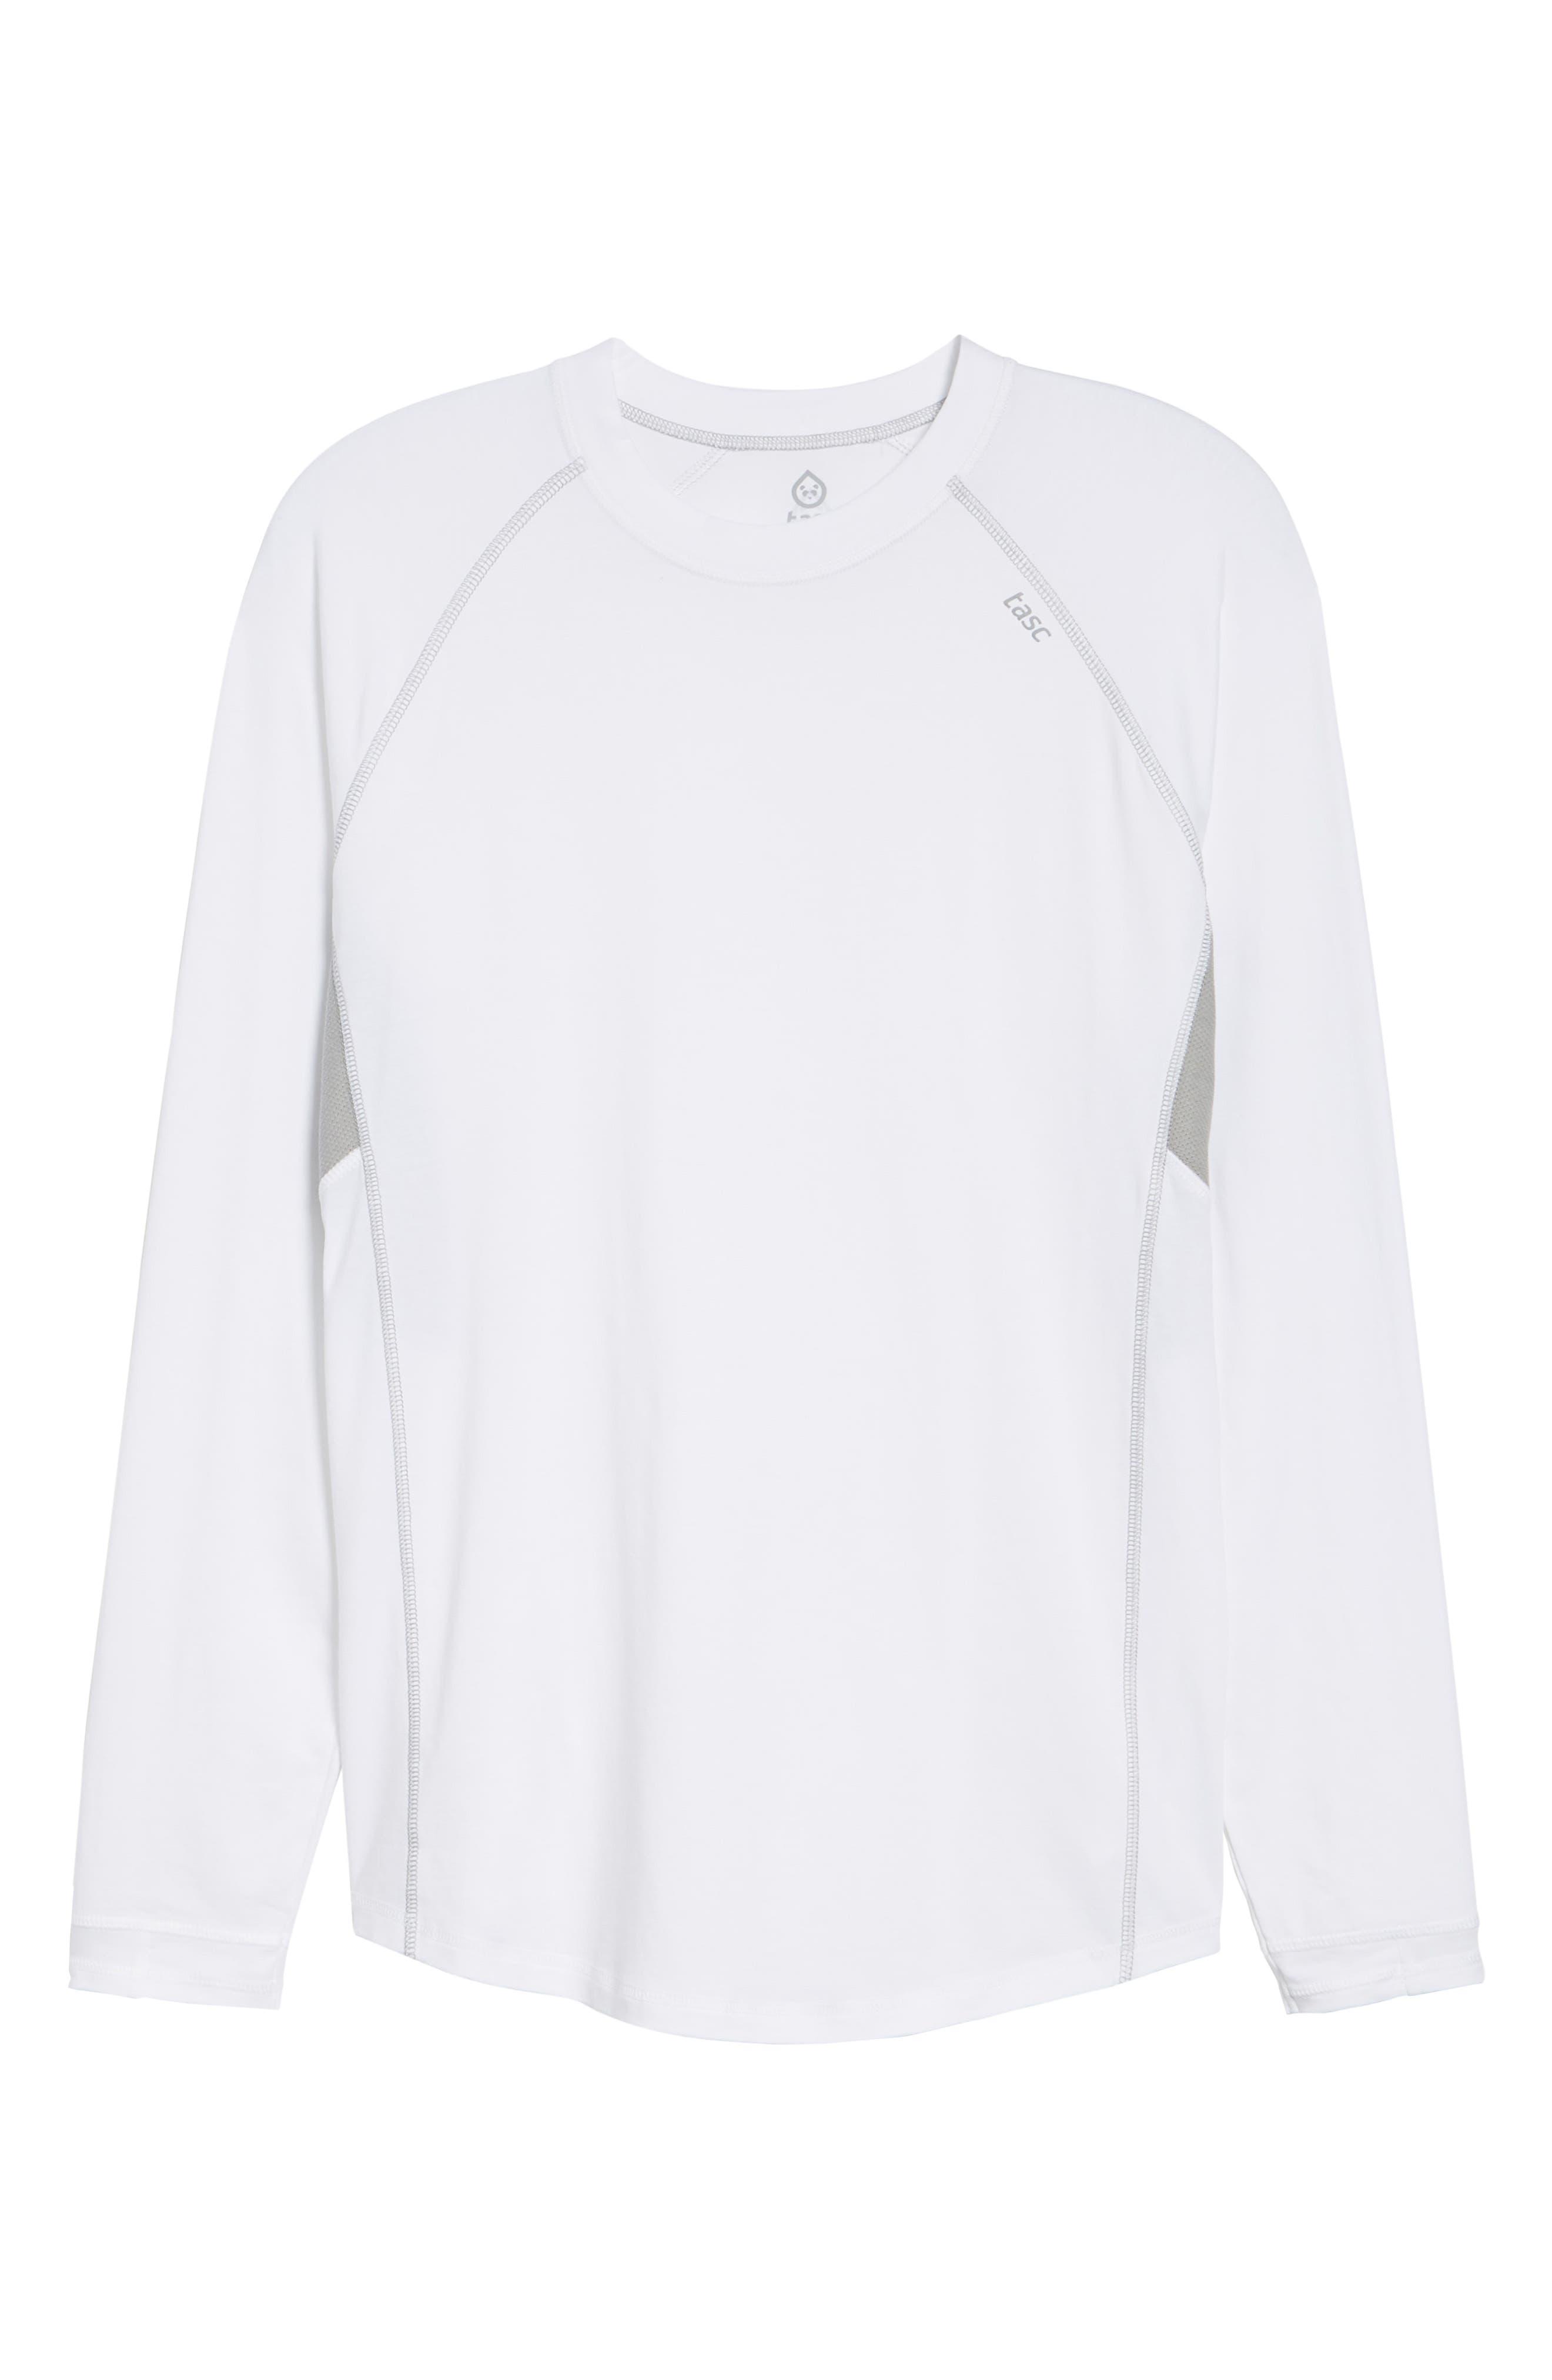 Charge II Long Sleeve T-Shirt,                             Alternate thumbnail 6, color,                             White